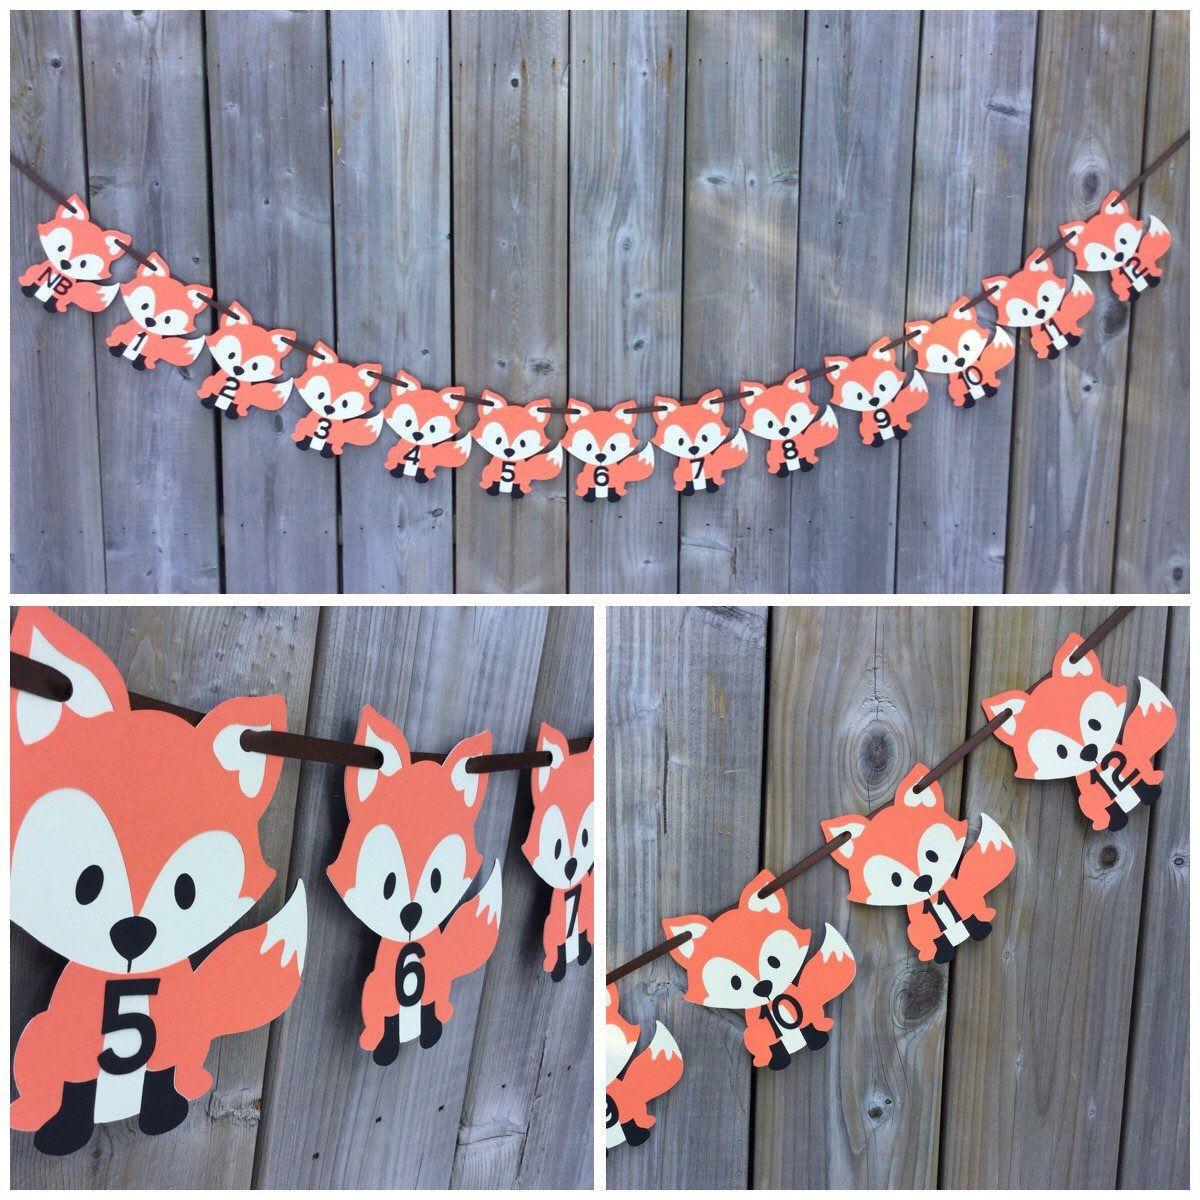 Fox 1st Year Photo banner, First Year Photo Banner, Monthly Photo Banner, Fox banner, Baby's First Year, Fox Birthday decoration by lilcraftychickadee on Etsy https://www.etsy.com/ca/listing/594508855/fox-1st-year-photo-banner-first-year